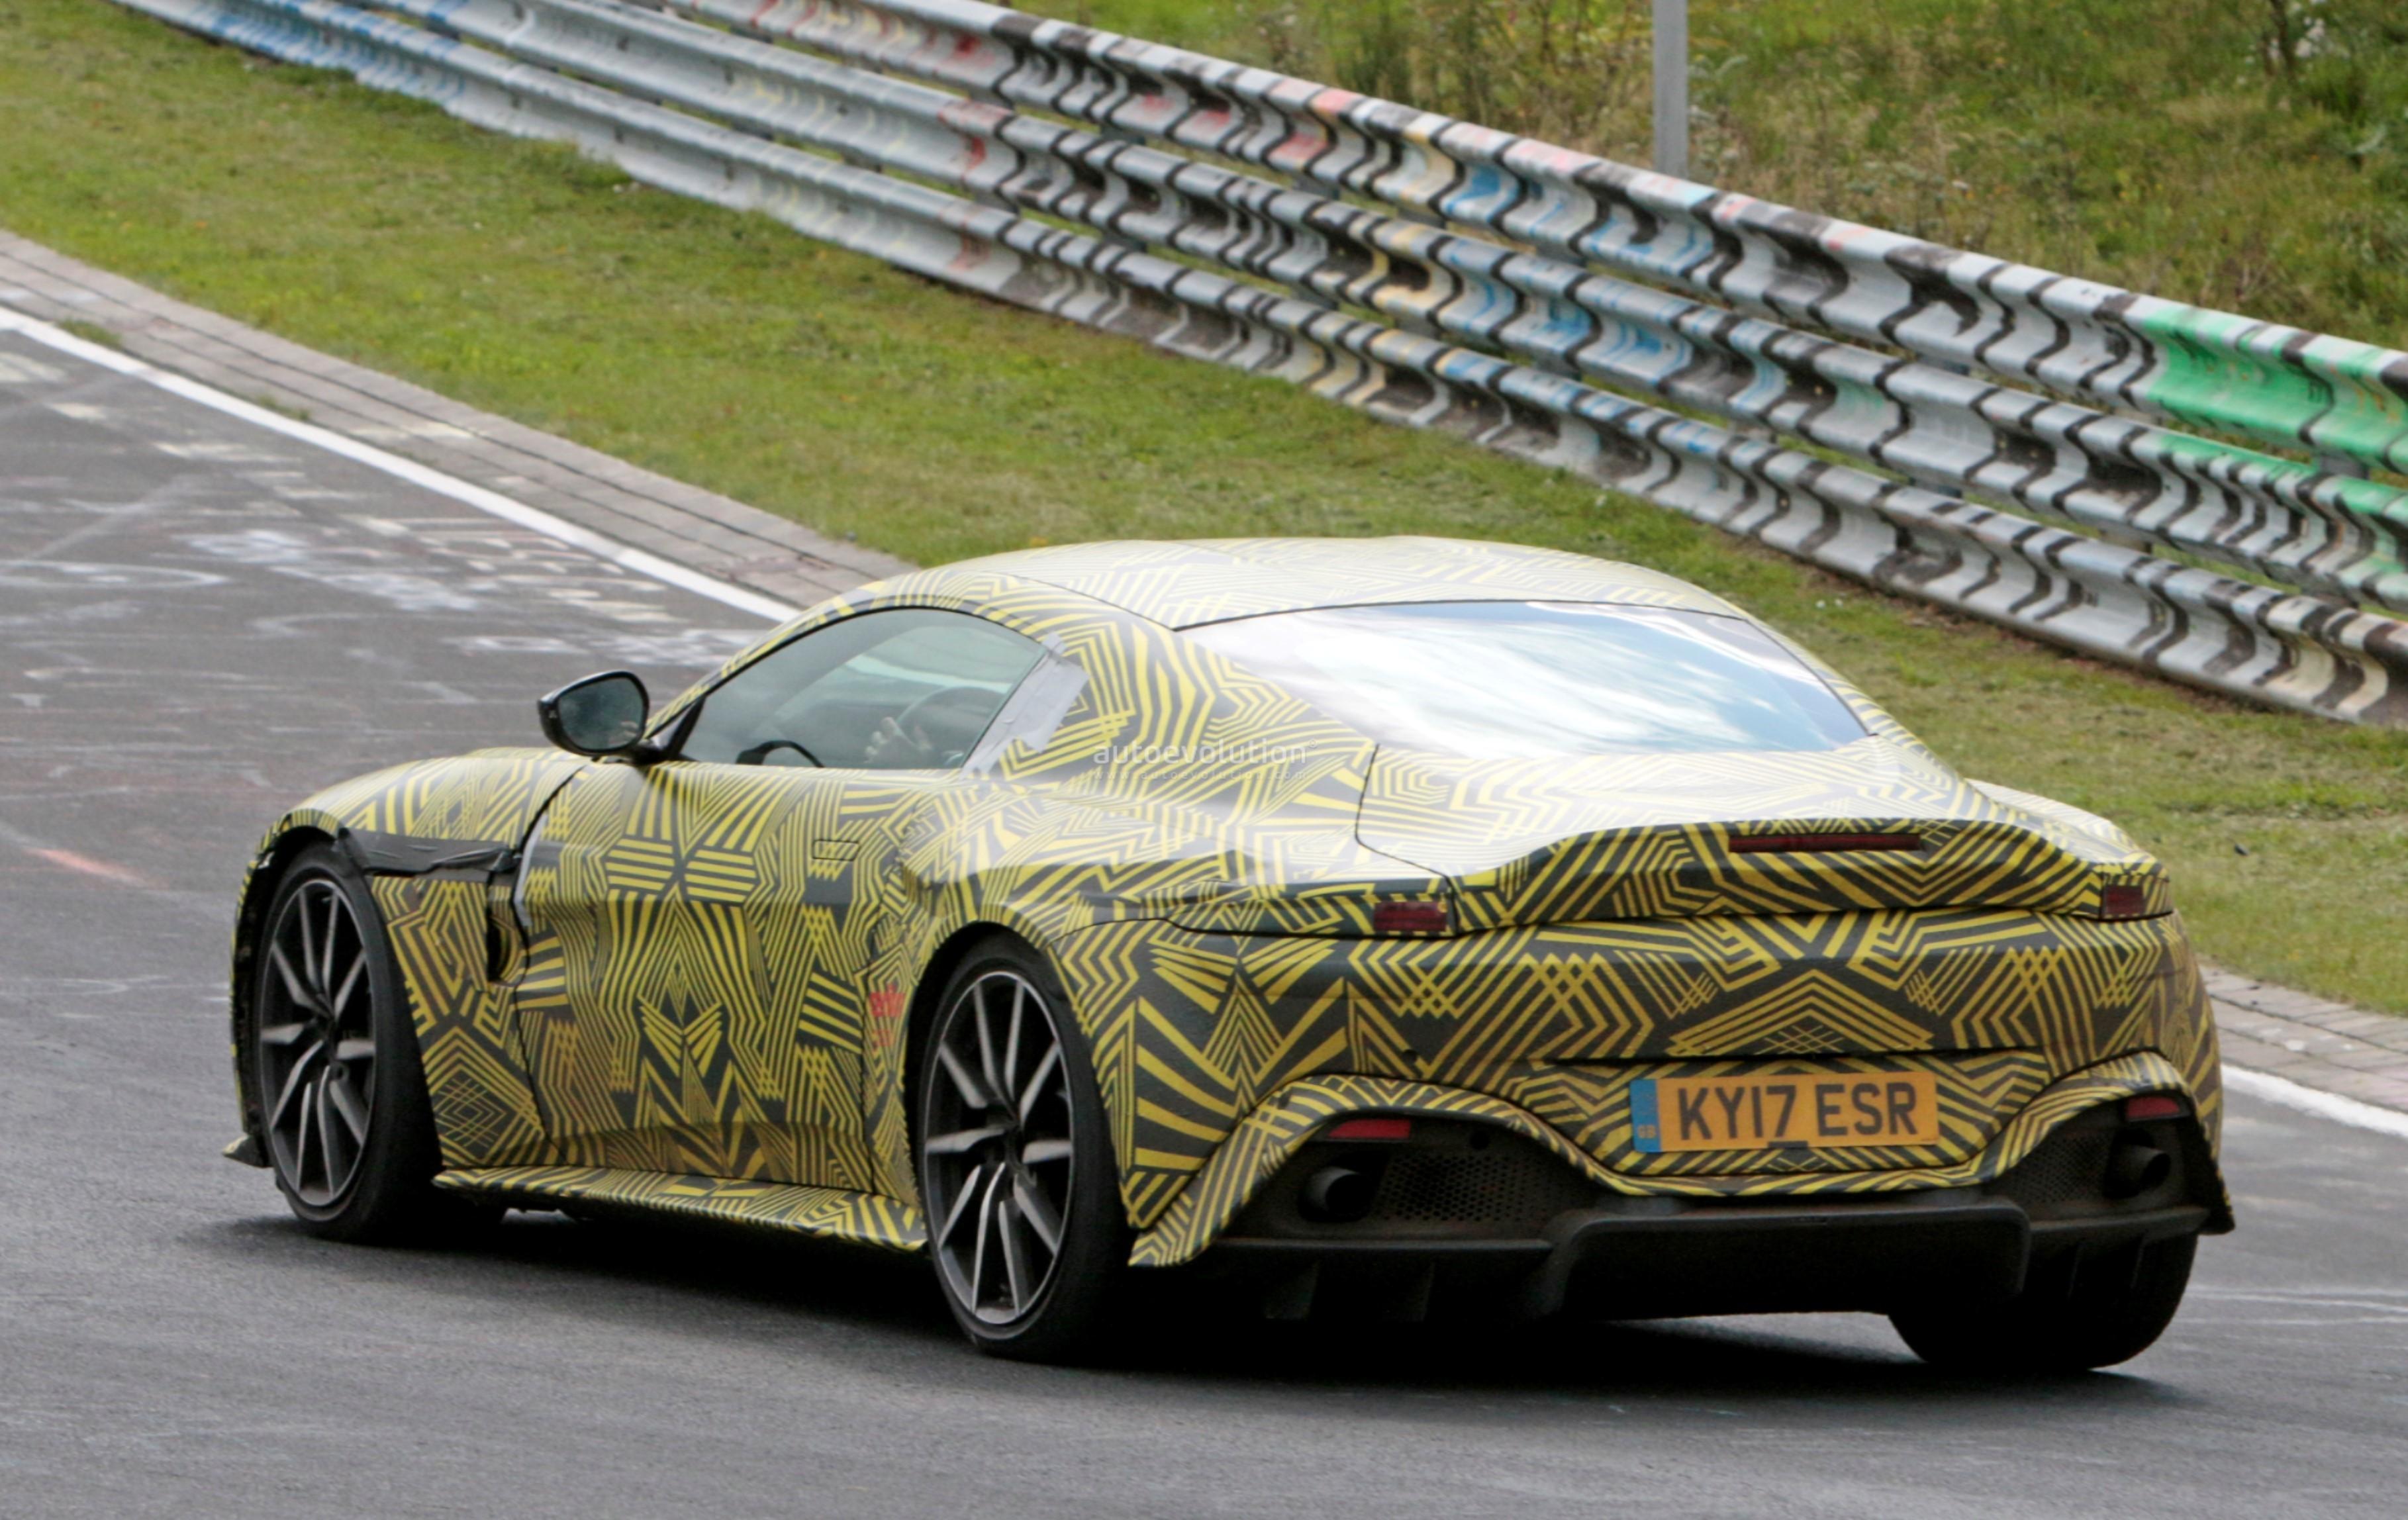 2019 Aston Martin Vantage Specifications Teased M177 V8 Develops